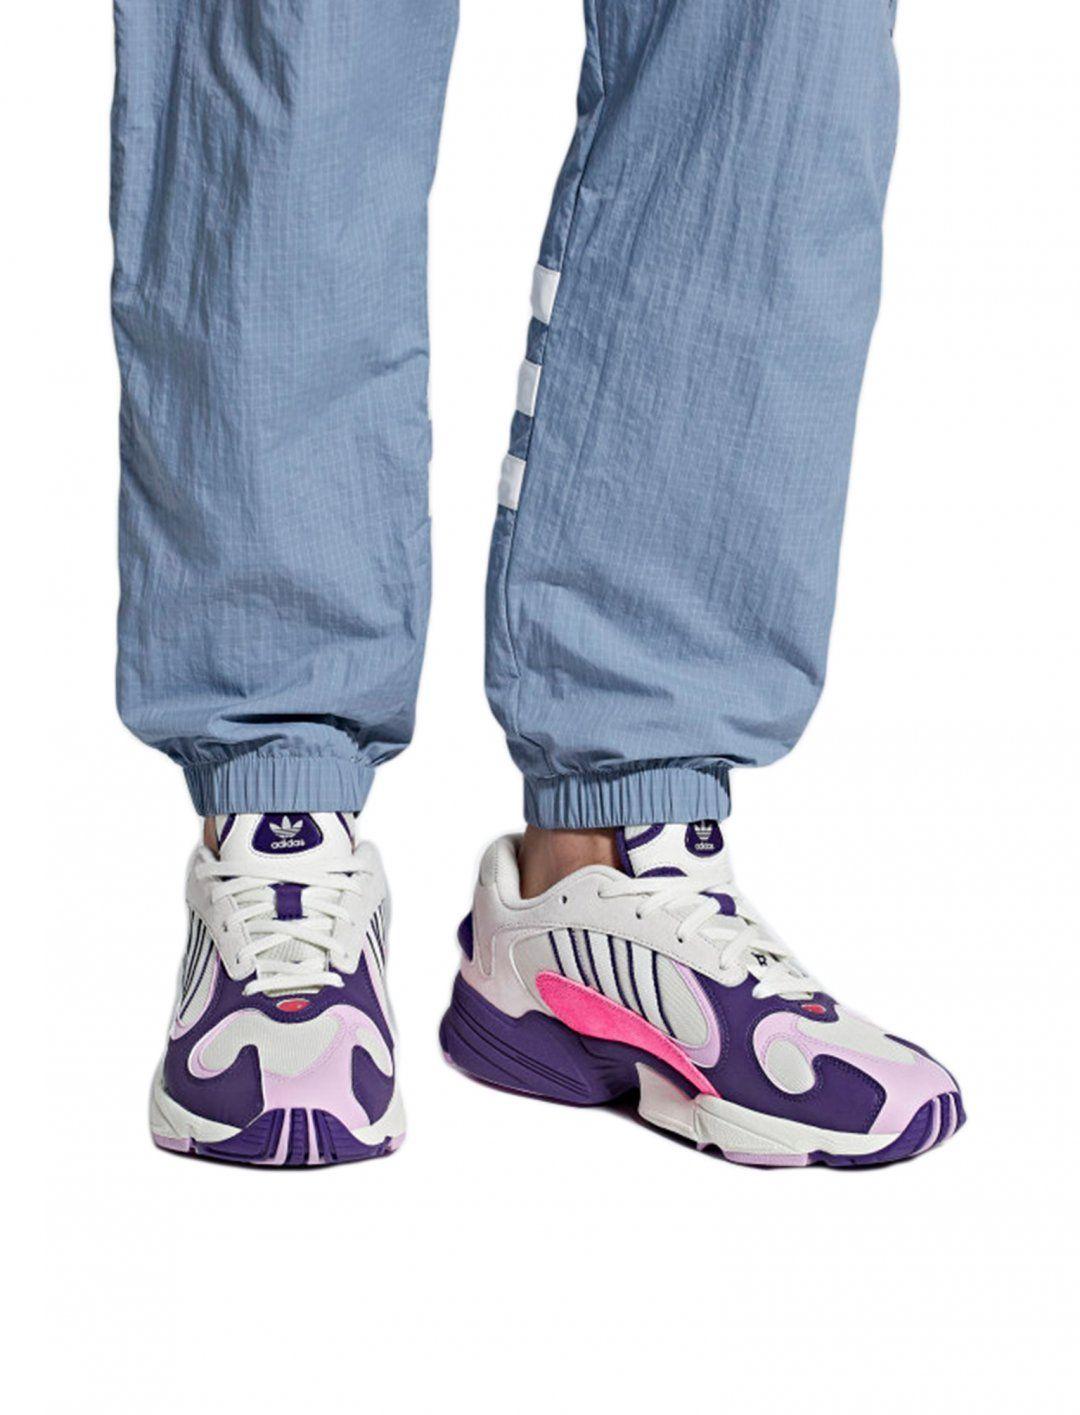 Brown Undecided Brown's AdidasPostkulture Chris Shoes lJ3uF1TcK